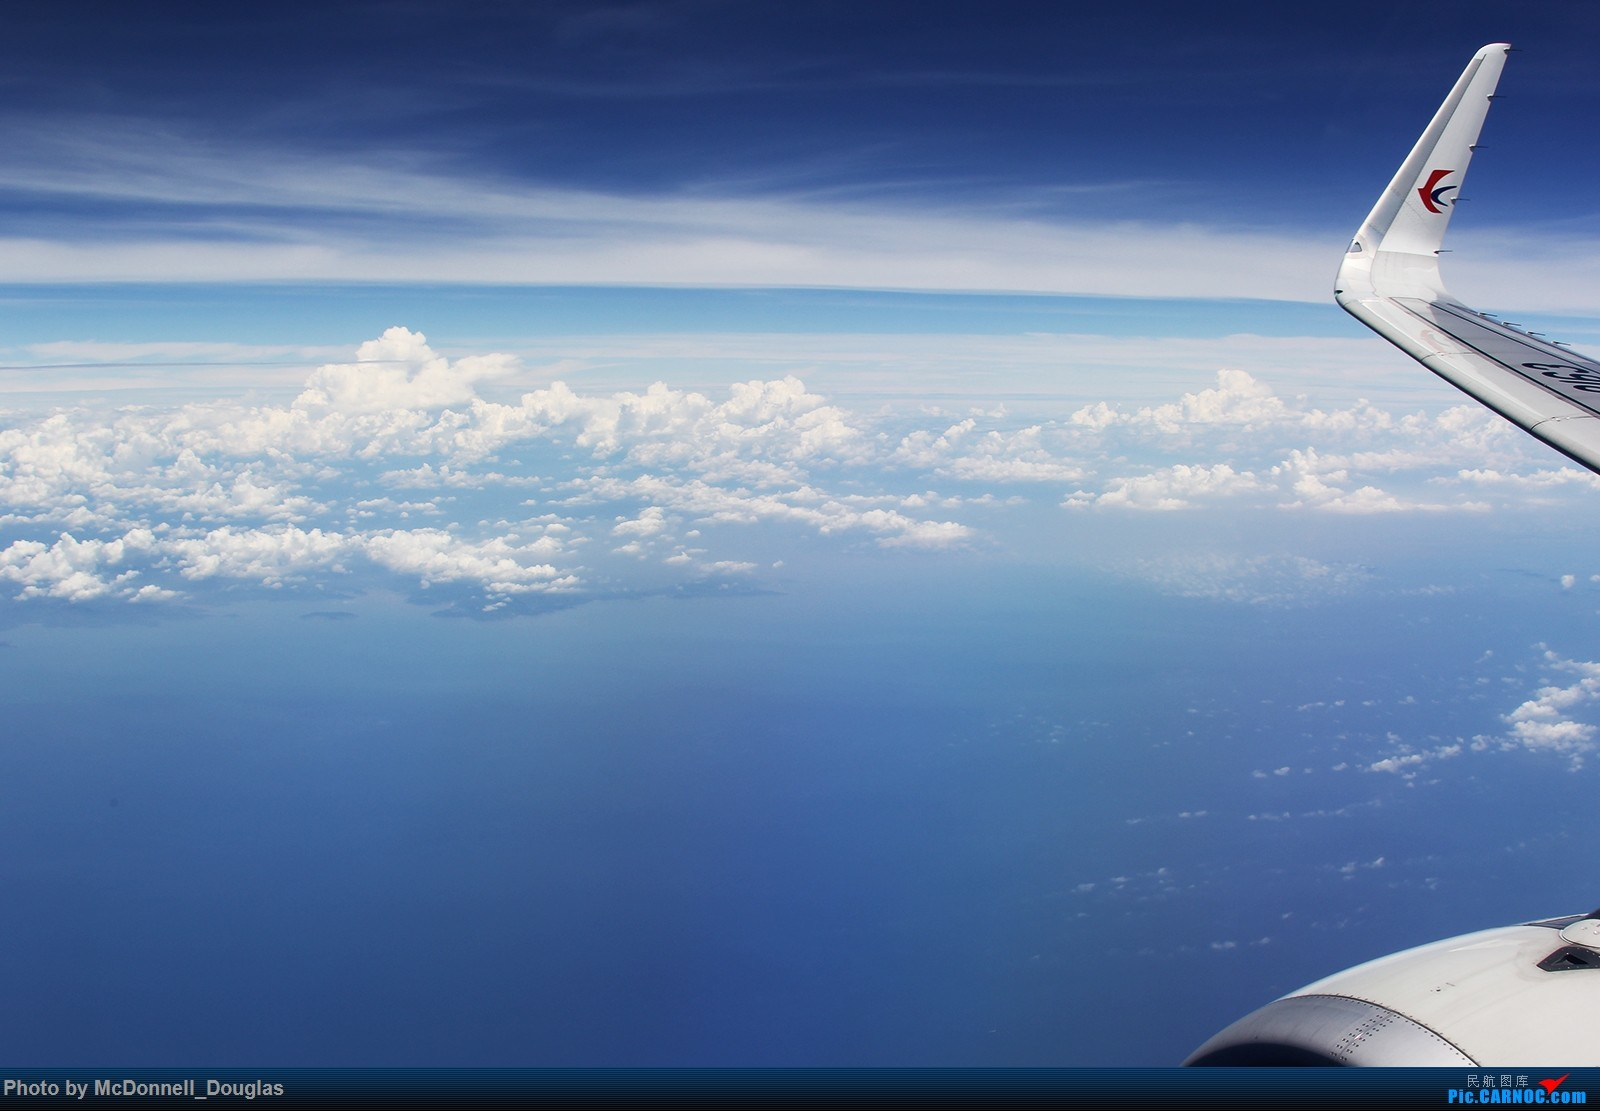 Re:[原创]【上海飞友会】【zc带你游天下(5)】起意只因一时冲动,飞过赤道去避暑,领略南太平洋别样的风光 AIRBUS A321-211/WL B-8163